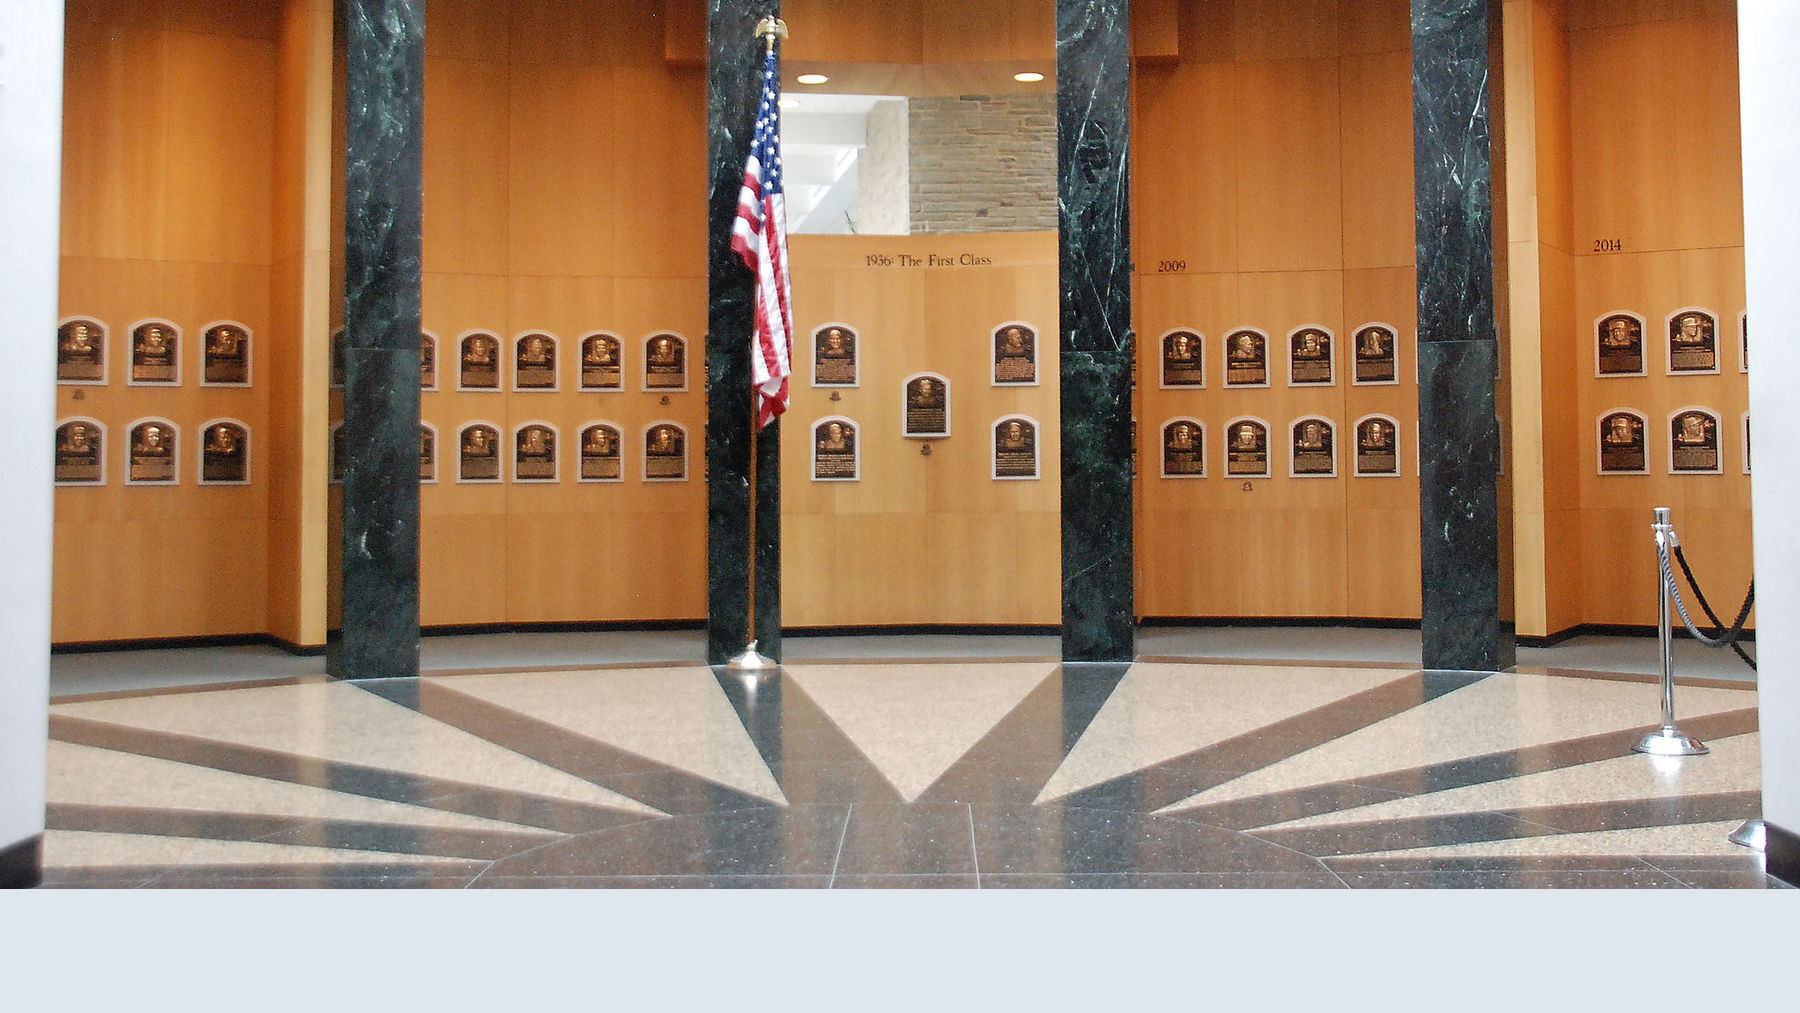 national baseball hall of fame. Photo via flickr